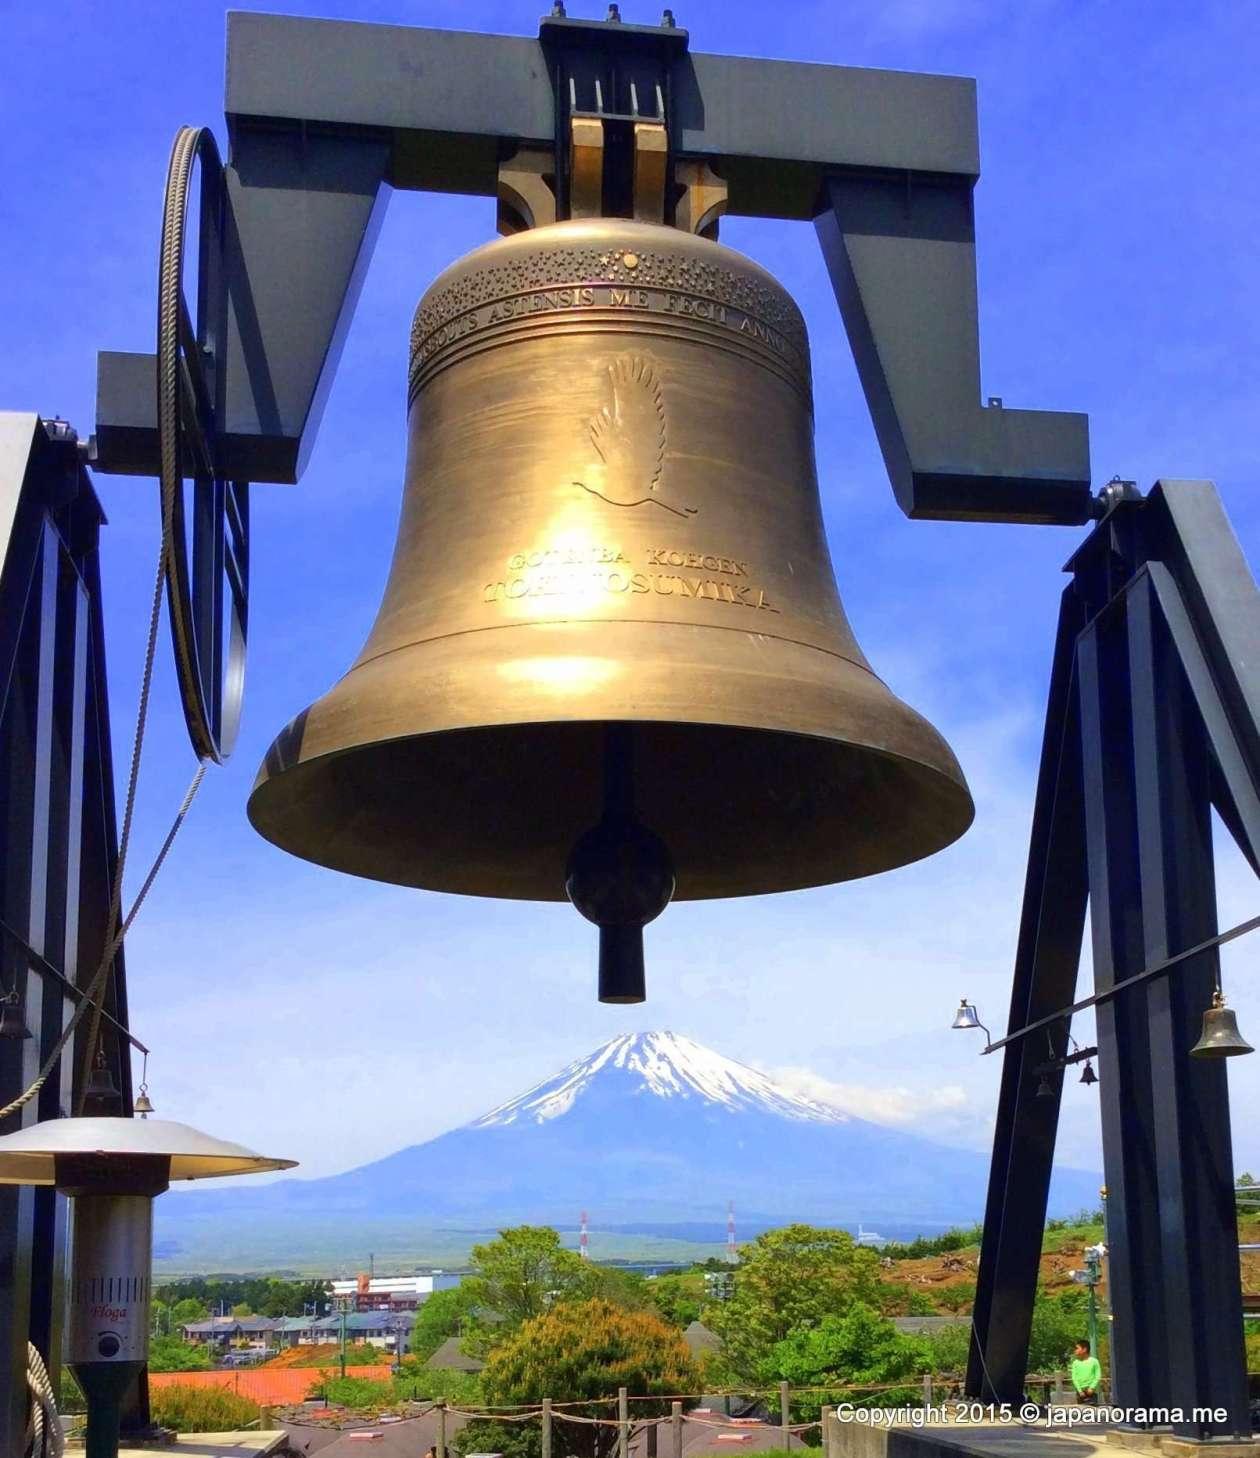 Mt Fuji under the Love Bell